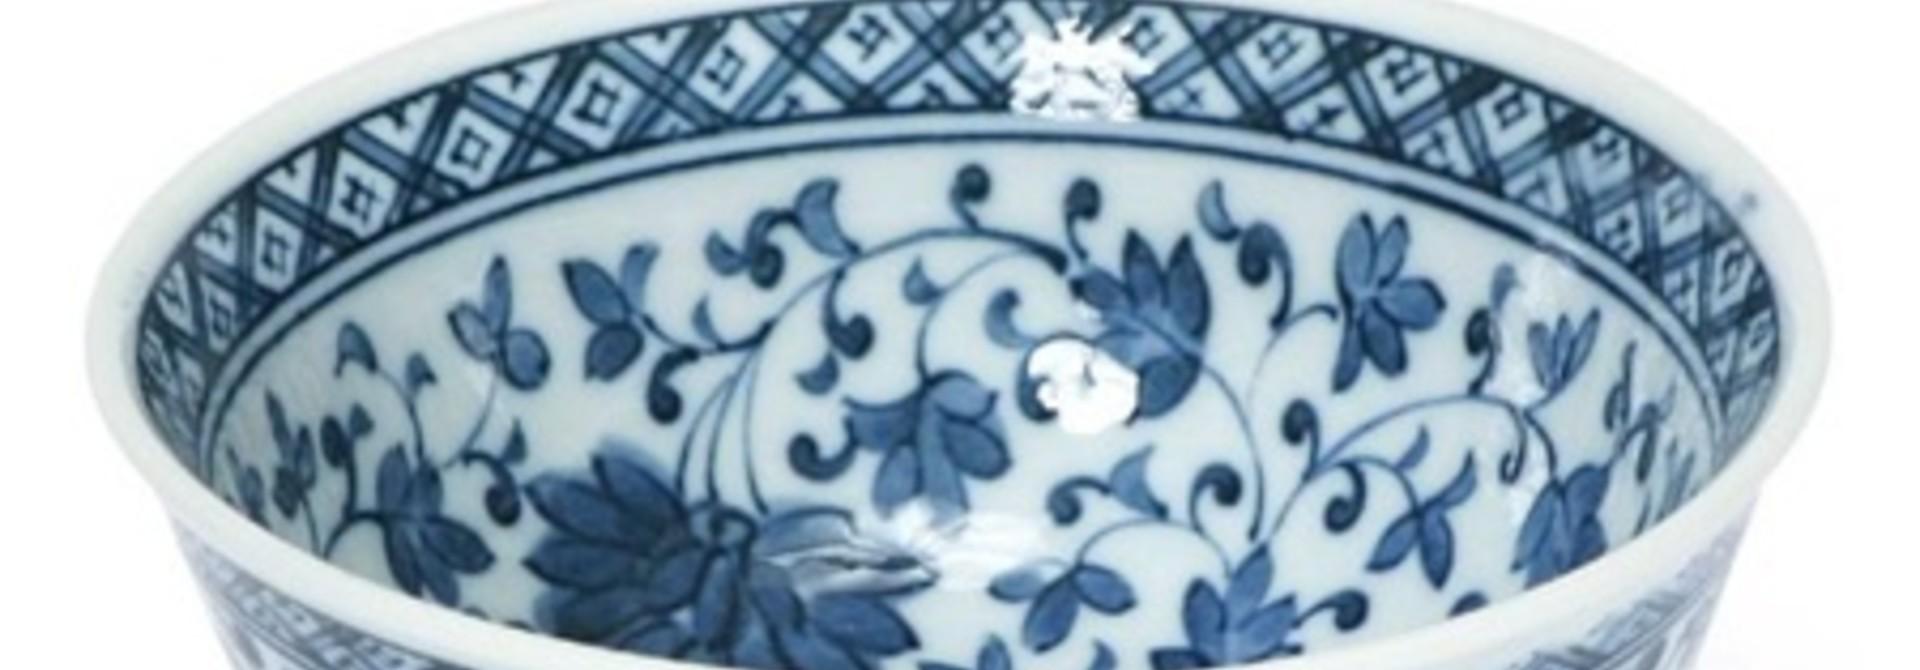 Bowl - Leaf - Blue